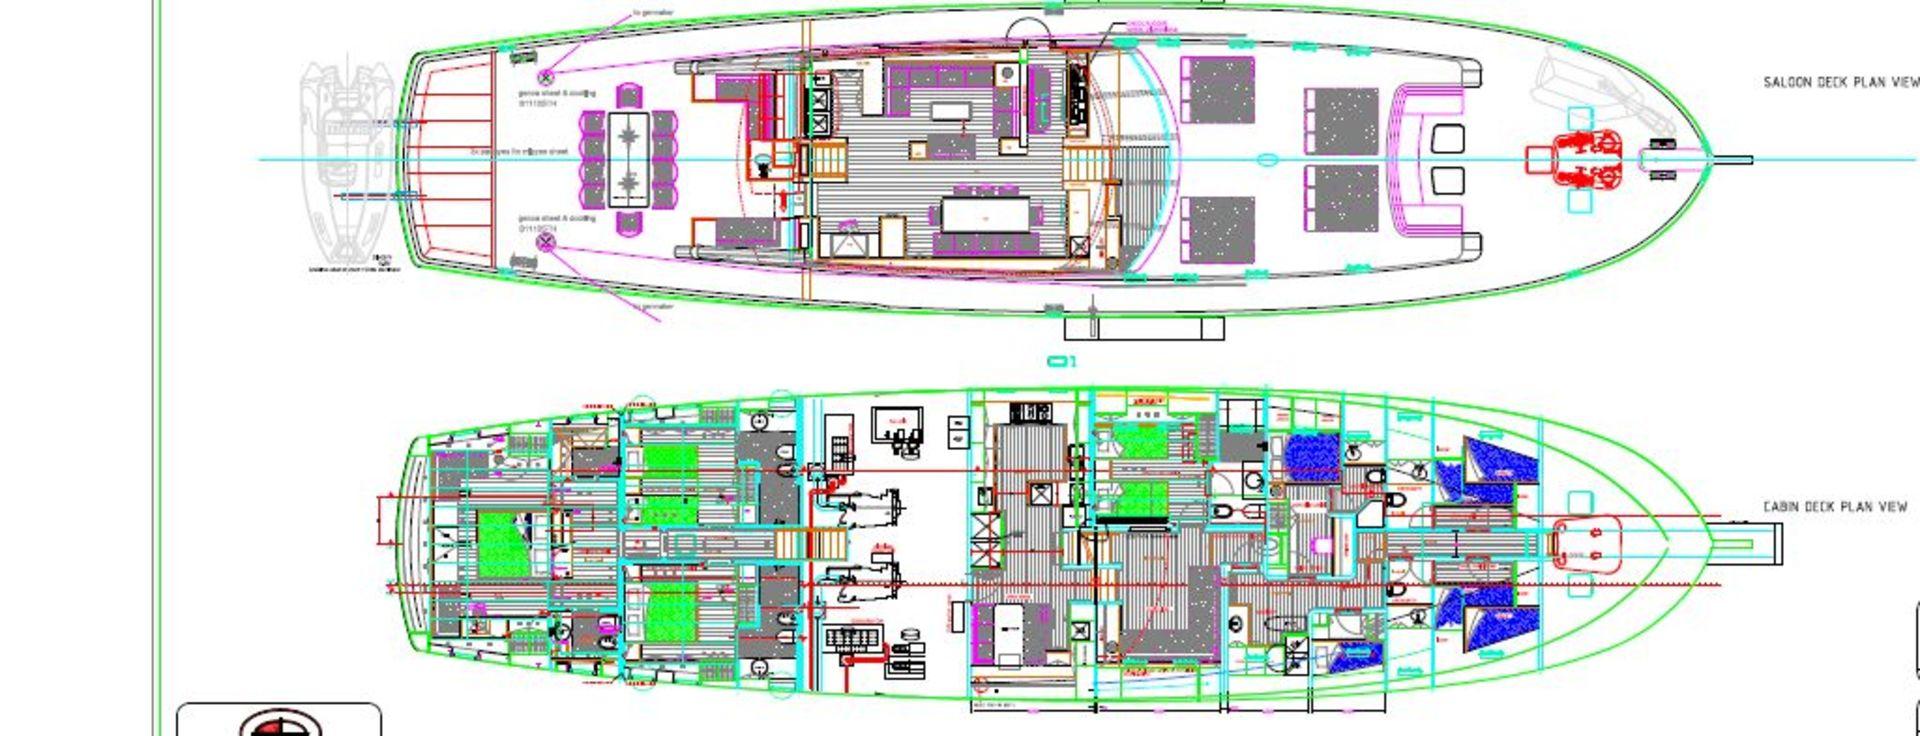 sailing nour layout interior